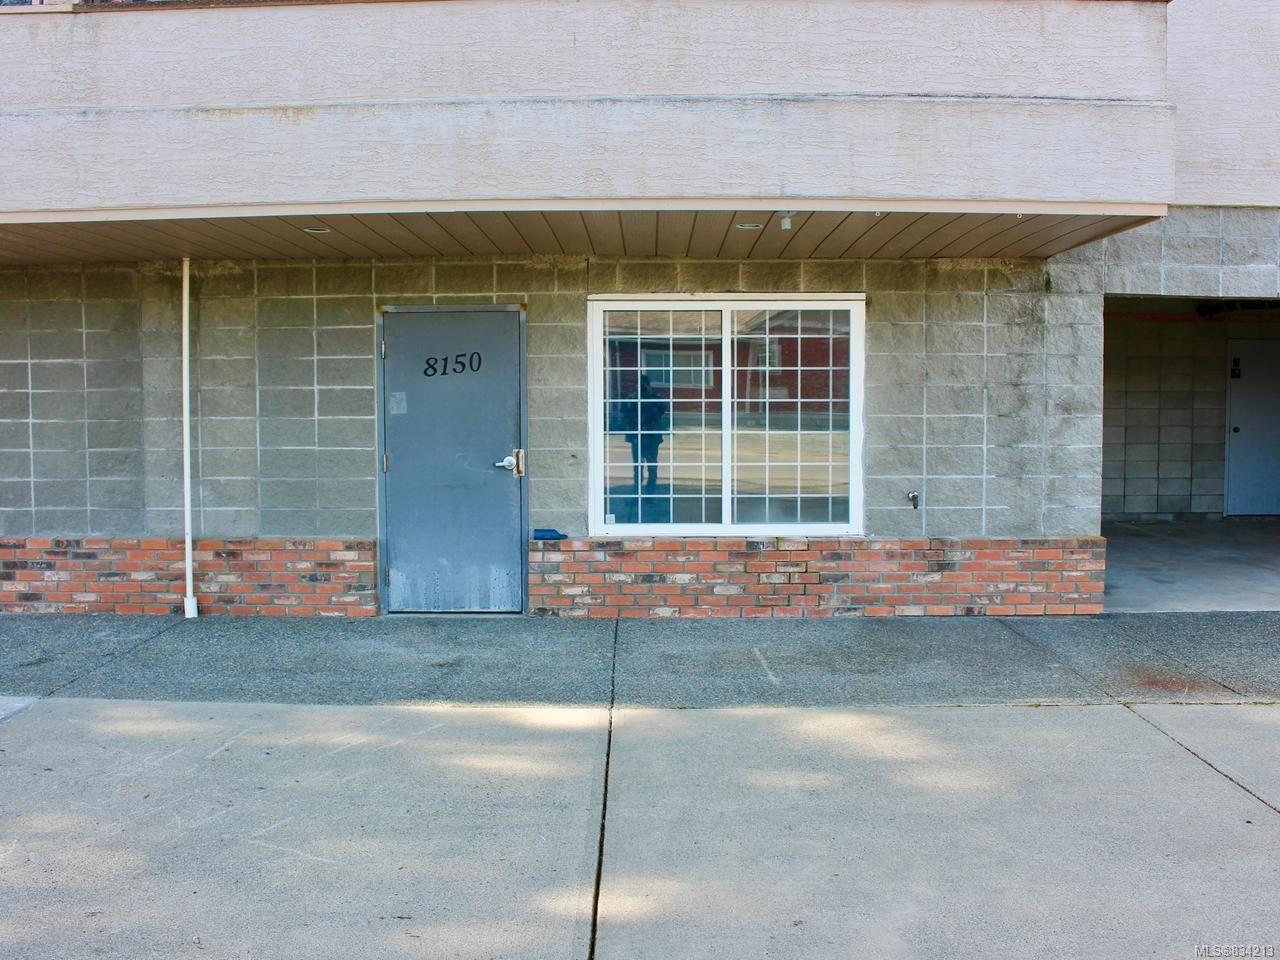 Photo 8: Photos: 1&2 8150 Arthur St in CROFTON: Du Crofton Mixed Use for sale (Duncan)  : MLS®# 834213